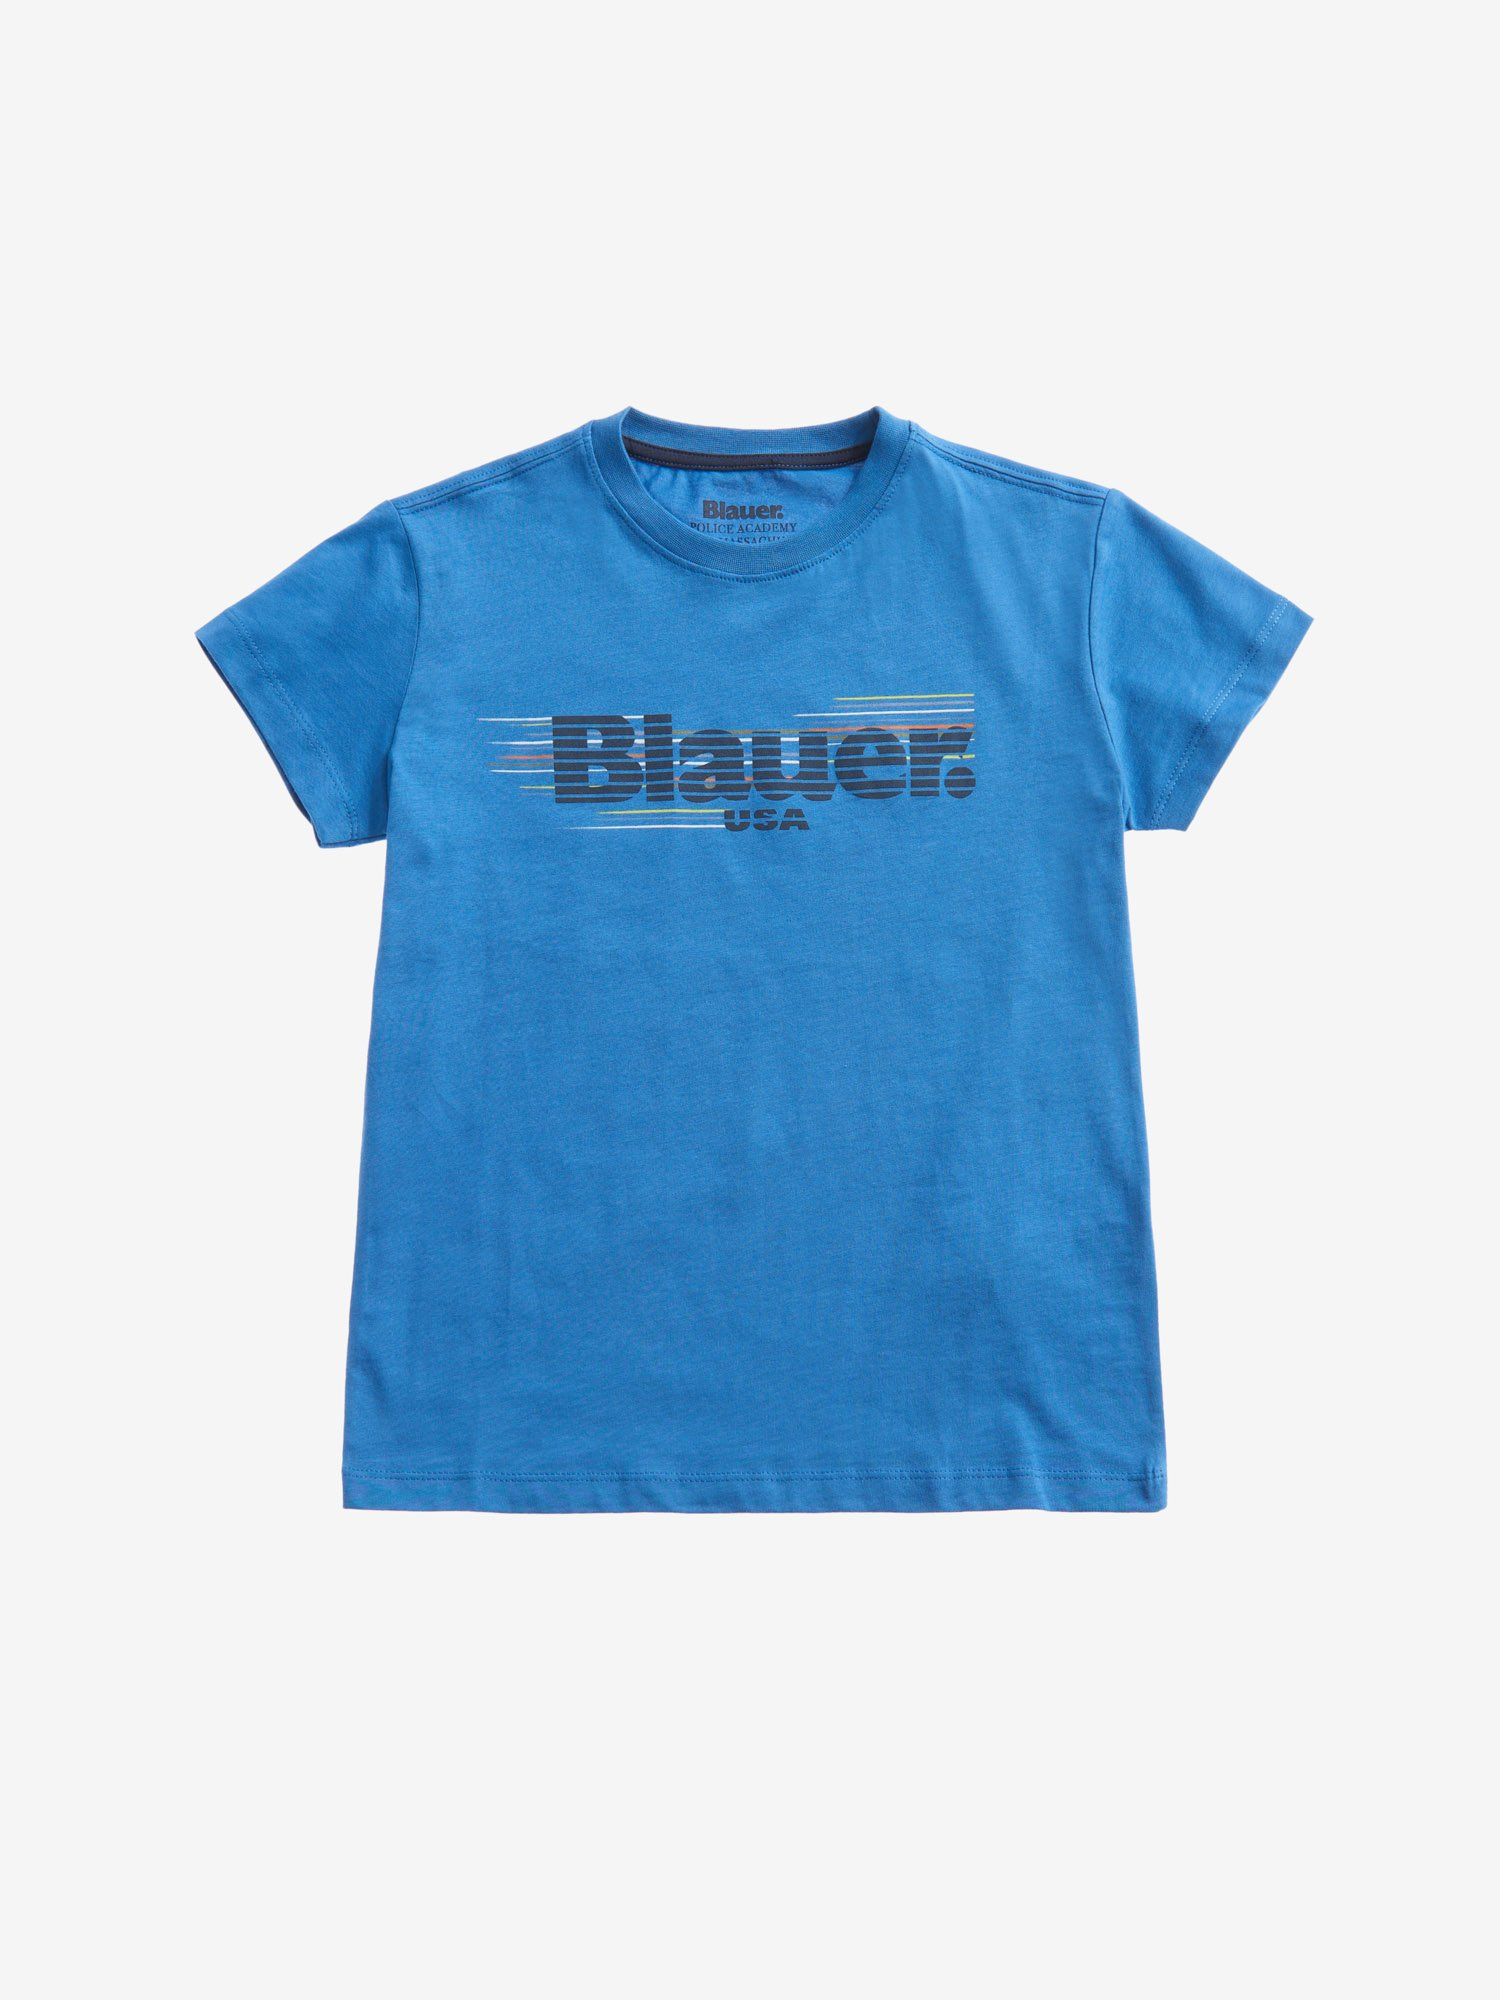 Blauer - BLAUER STRIPED T-SHIRT - Light Sapphire Blue - Blauer